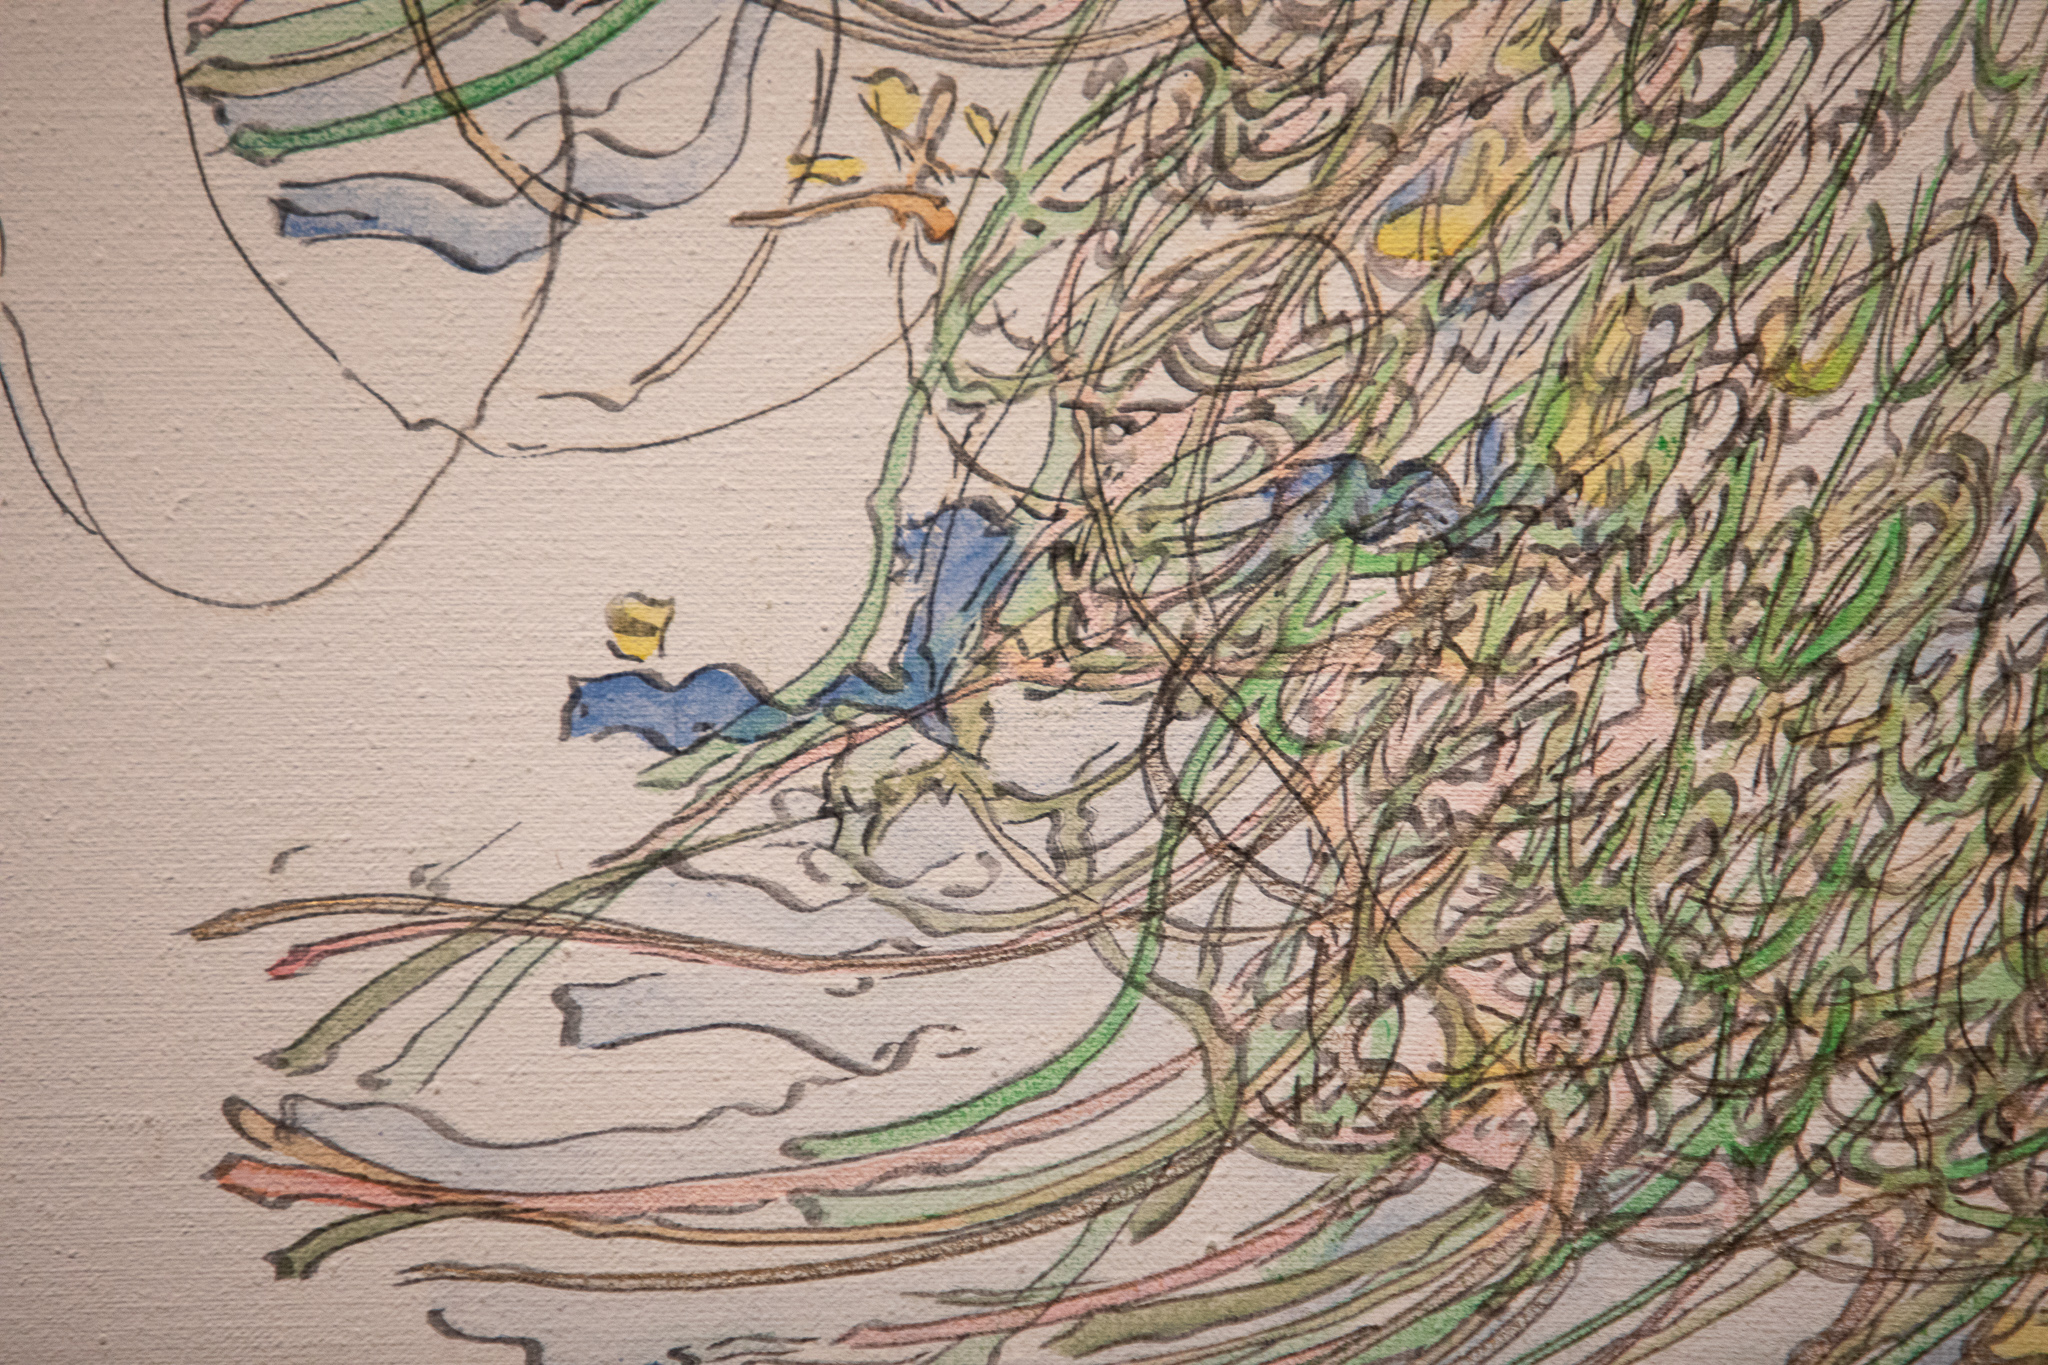 U2A3874 - Sheldon art exhibition shows waste drives human life